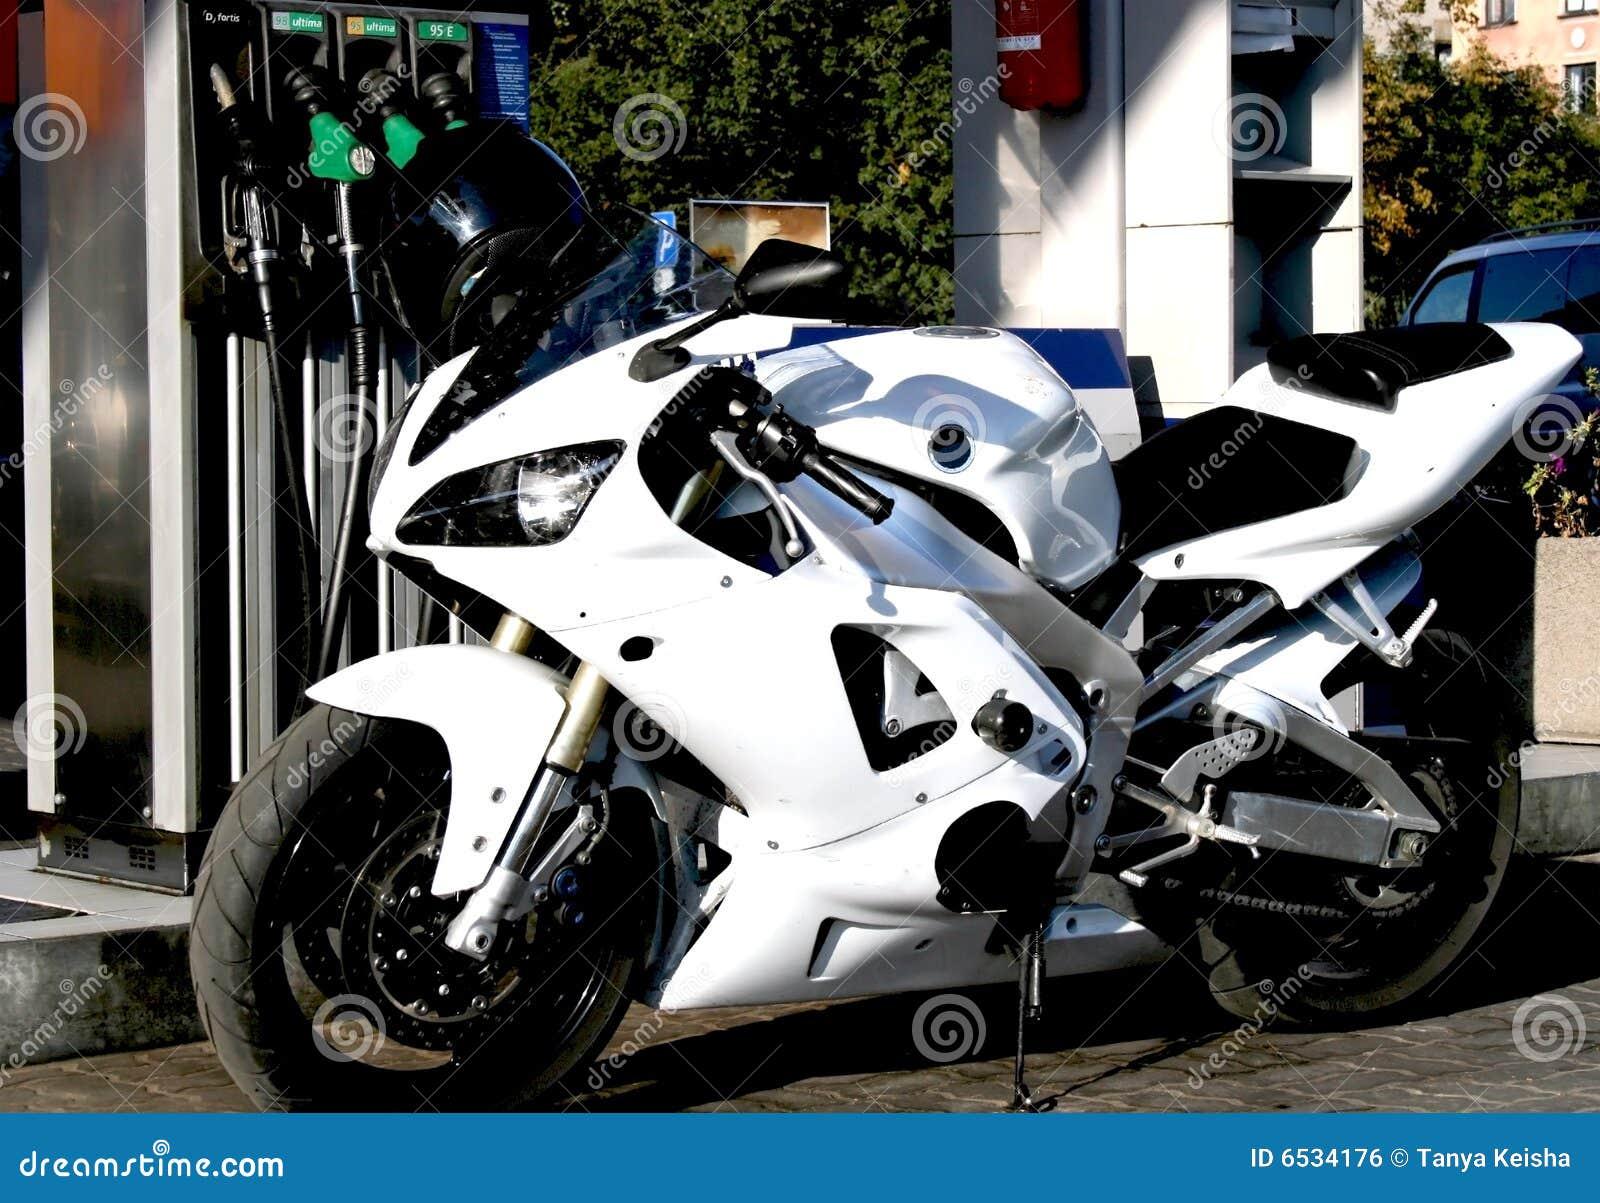 Yamaha Motorcycles Near Me